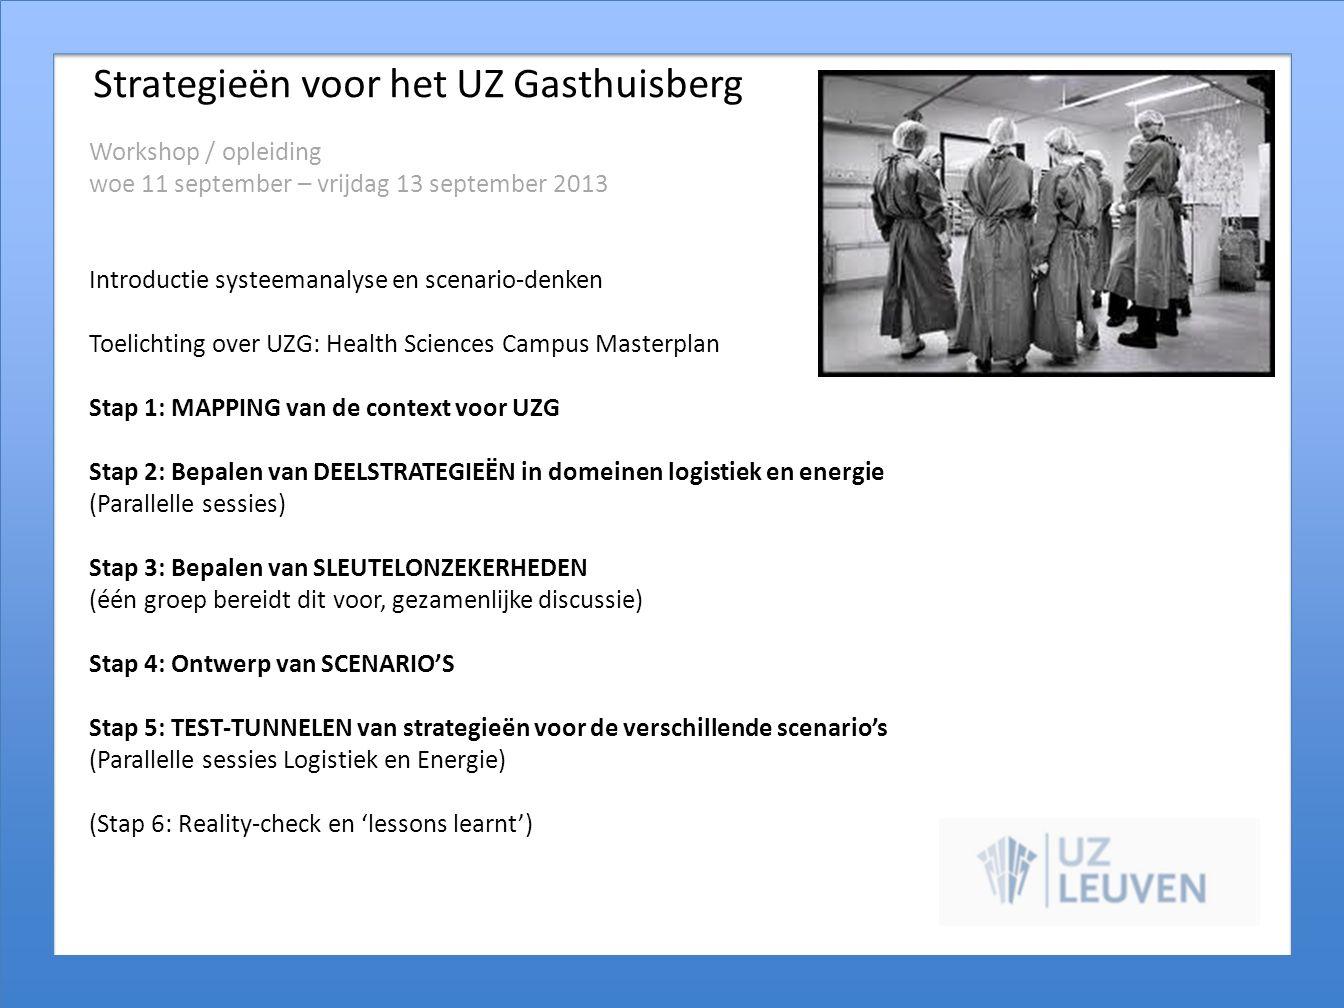 Strategieën voor het UZ Gasthuisberg woe 11 september – vrijdag 13 september 2013 Doelstelling: Opleiding 2003 20132030 Strategieën en Scenario's >>>>>>>>>>>>> Scenario-workshop voor opleidingsdoeleinden >>>>>>>>>> Reality-check Vooruitblik >>>>>>>>>>>>>>